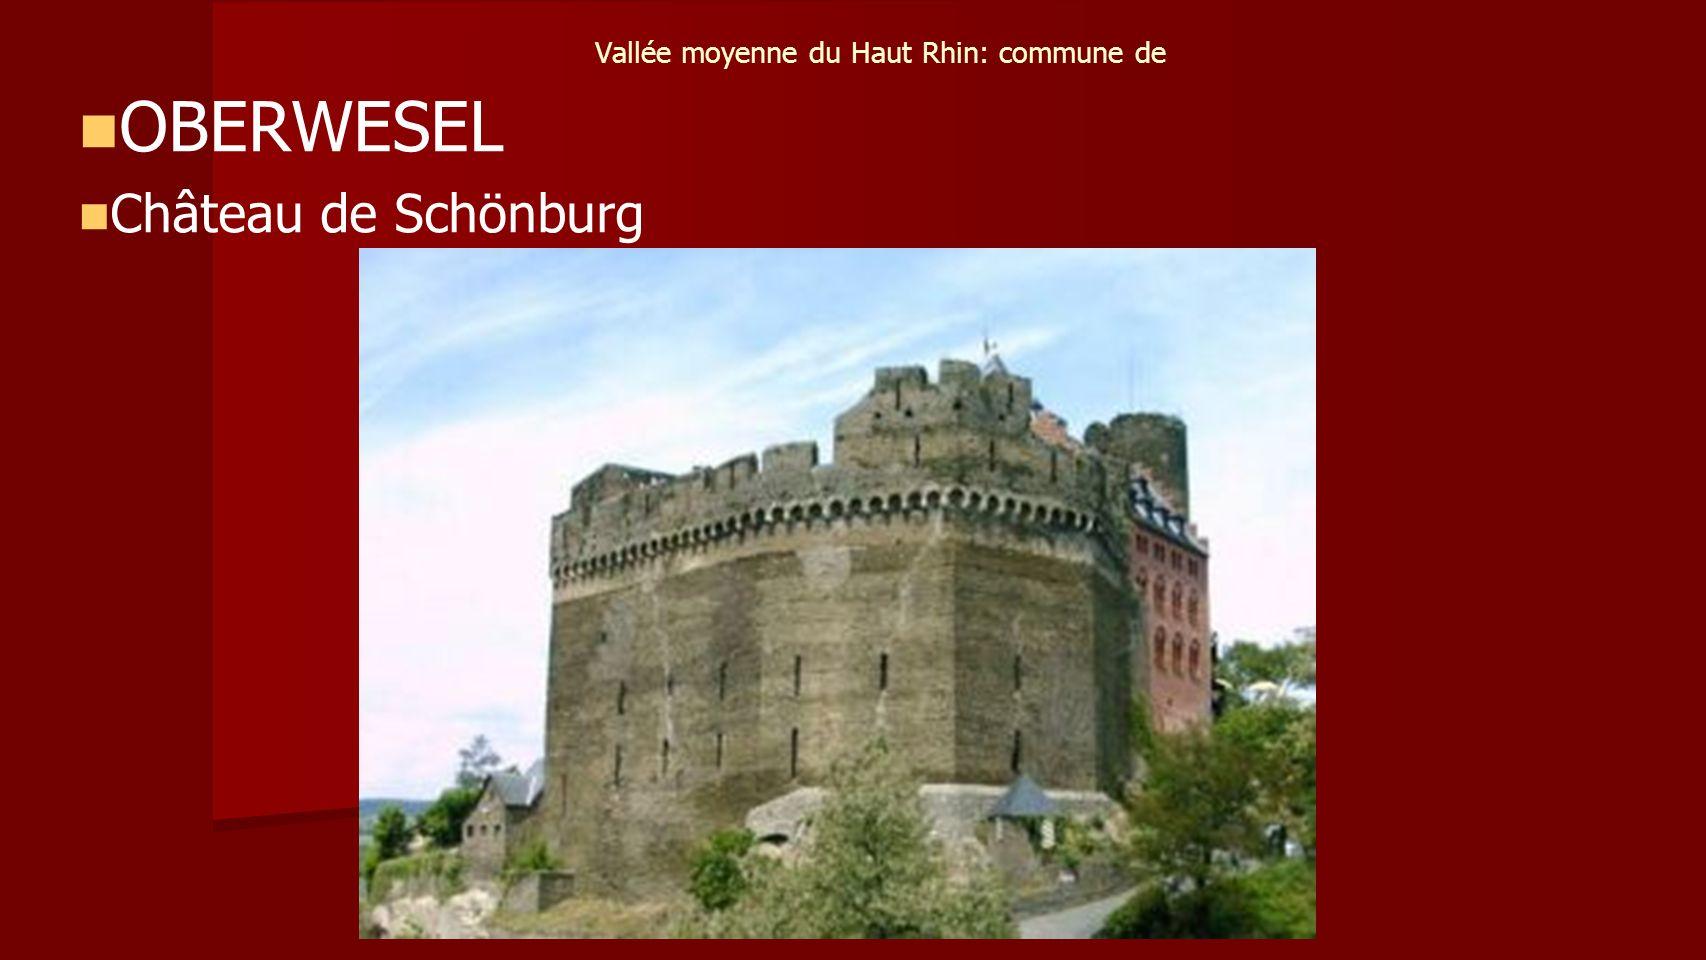 Vallée moyenne du Haut Rhin: commune de OBERWESEL Château de Schönburg